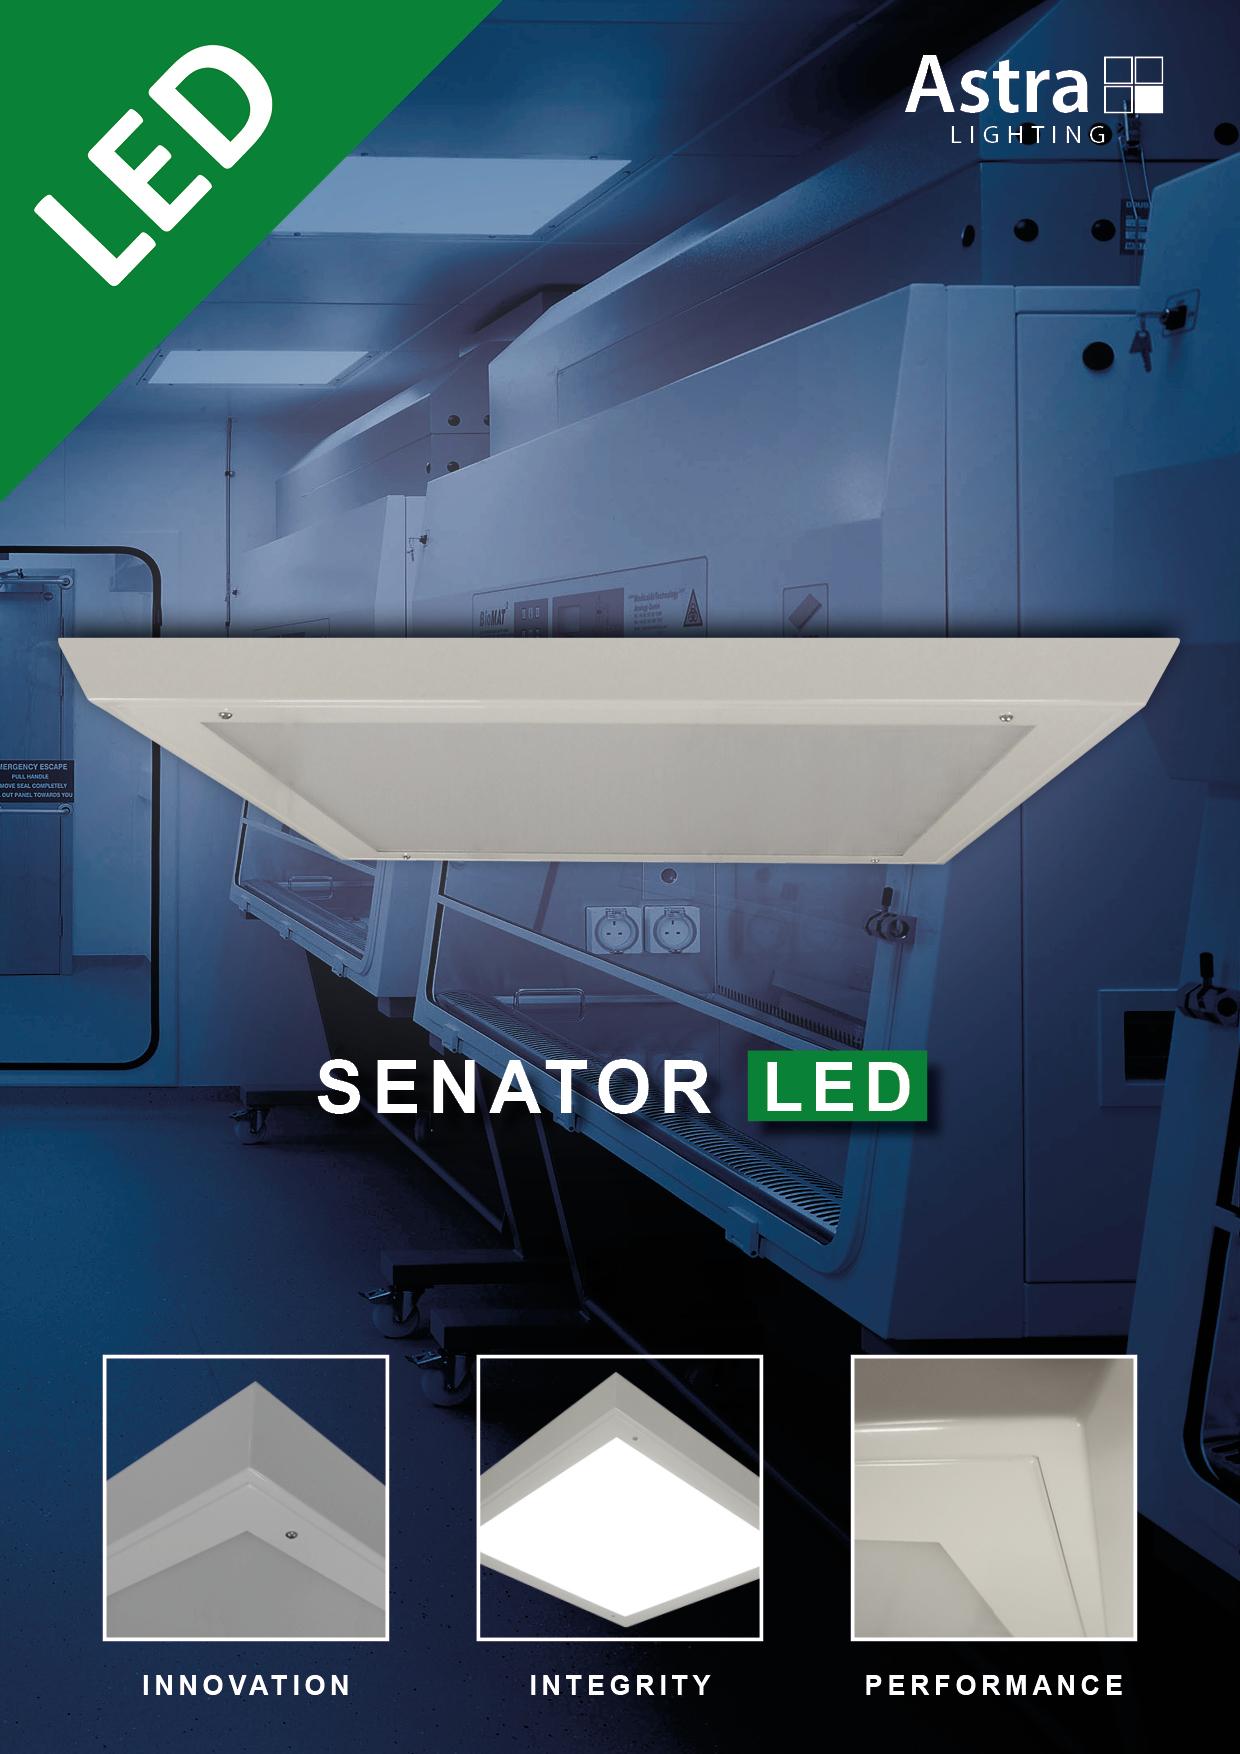 SENATOR LED 114.130616